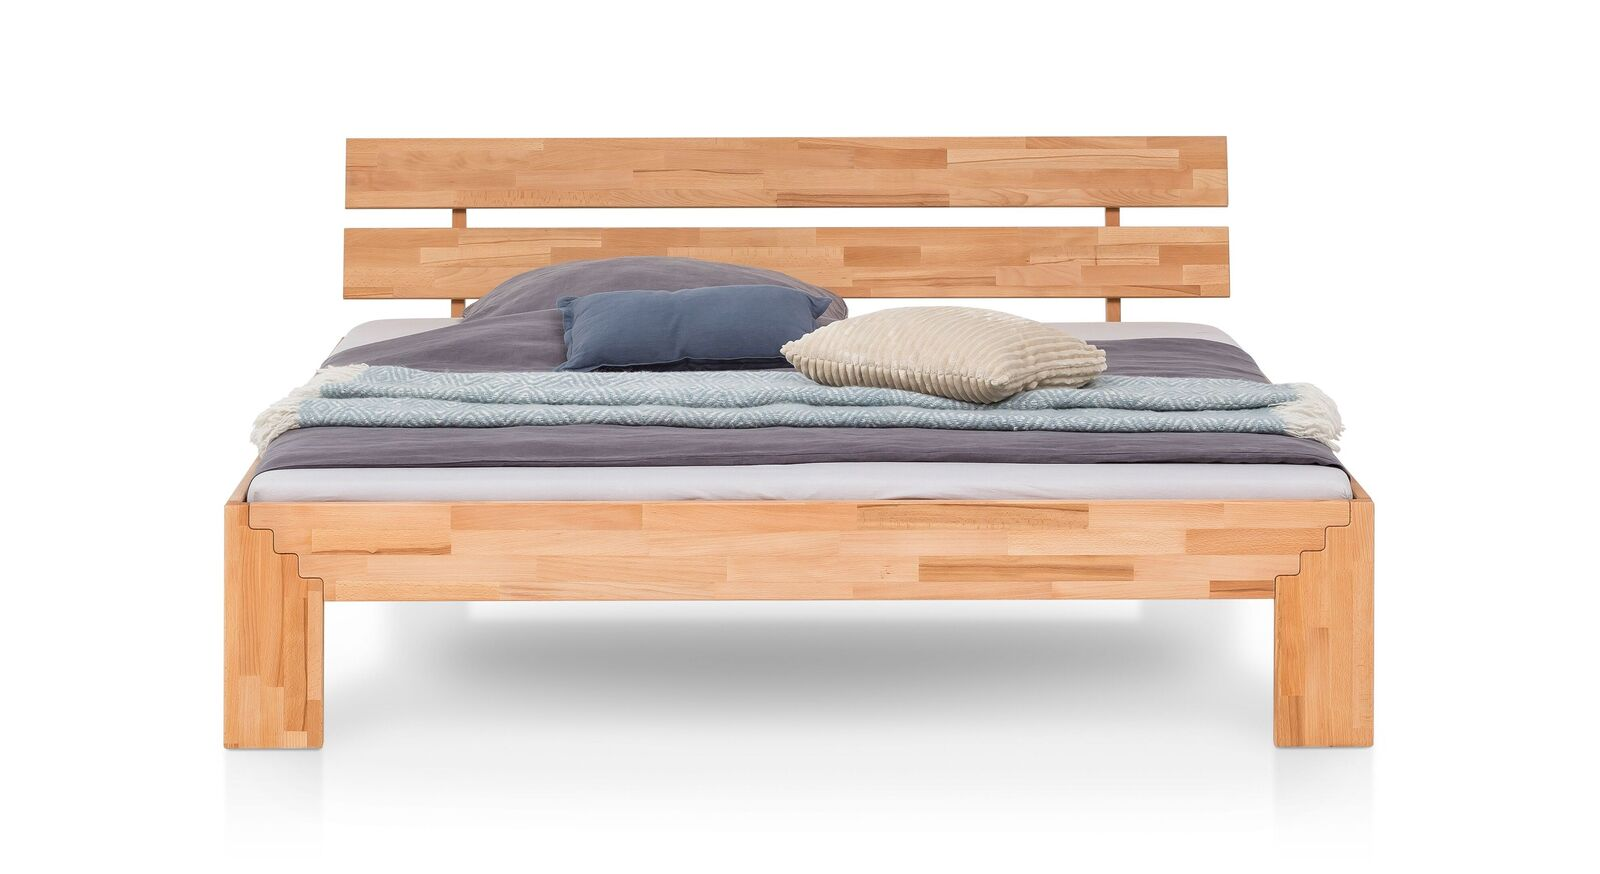 Bettgestell Oslin aus gemasertem Holz